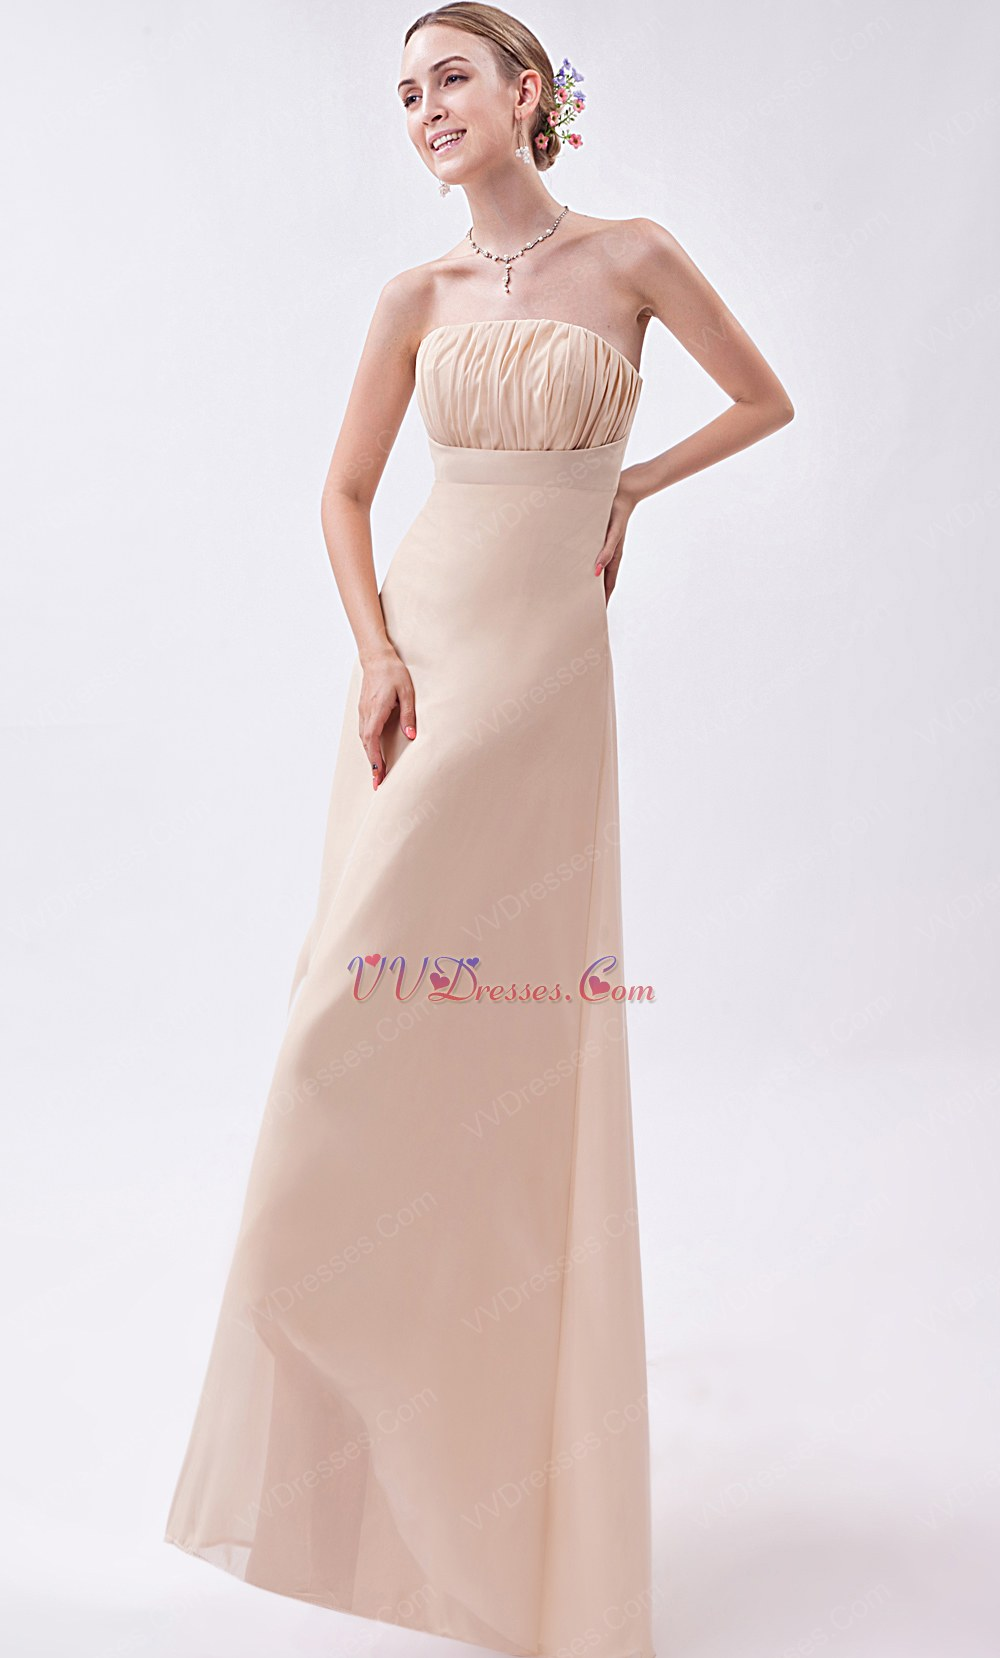 champagne color wedding dresses reviews champagne colored wedding dresses Champagne Color Wedding Dresses Reviews